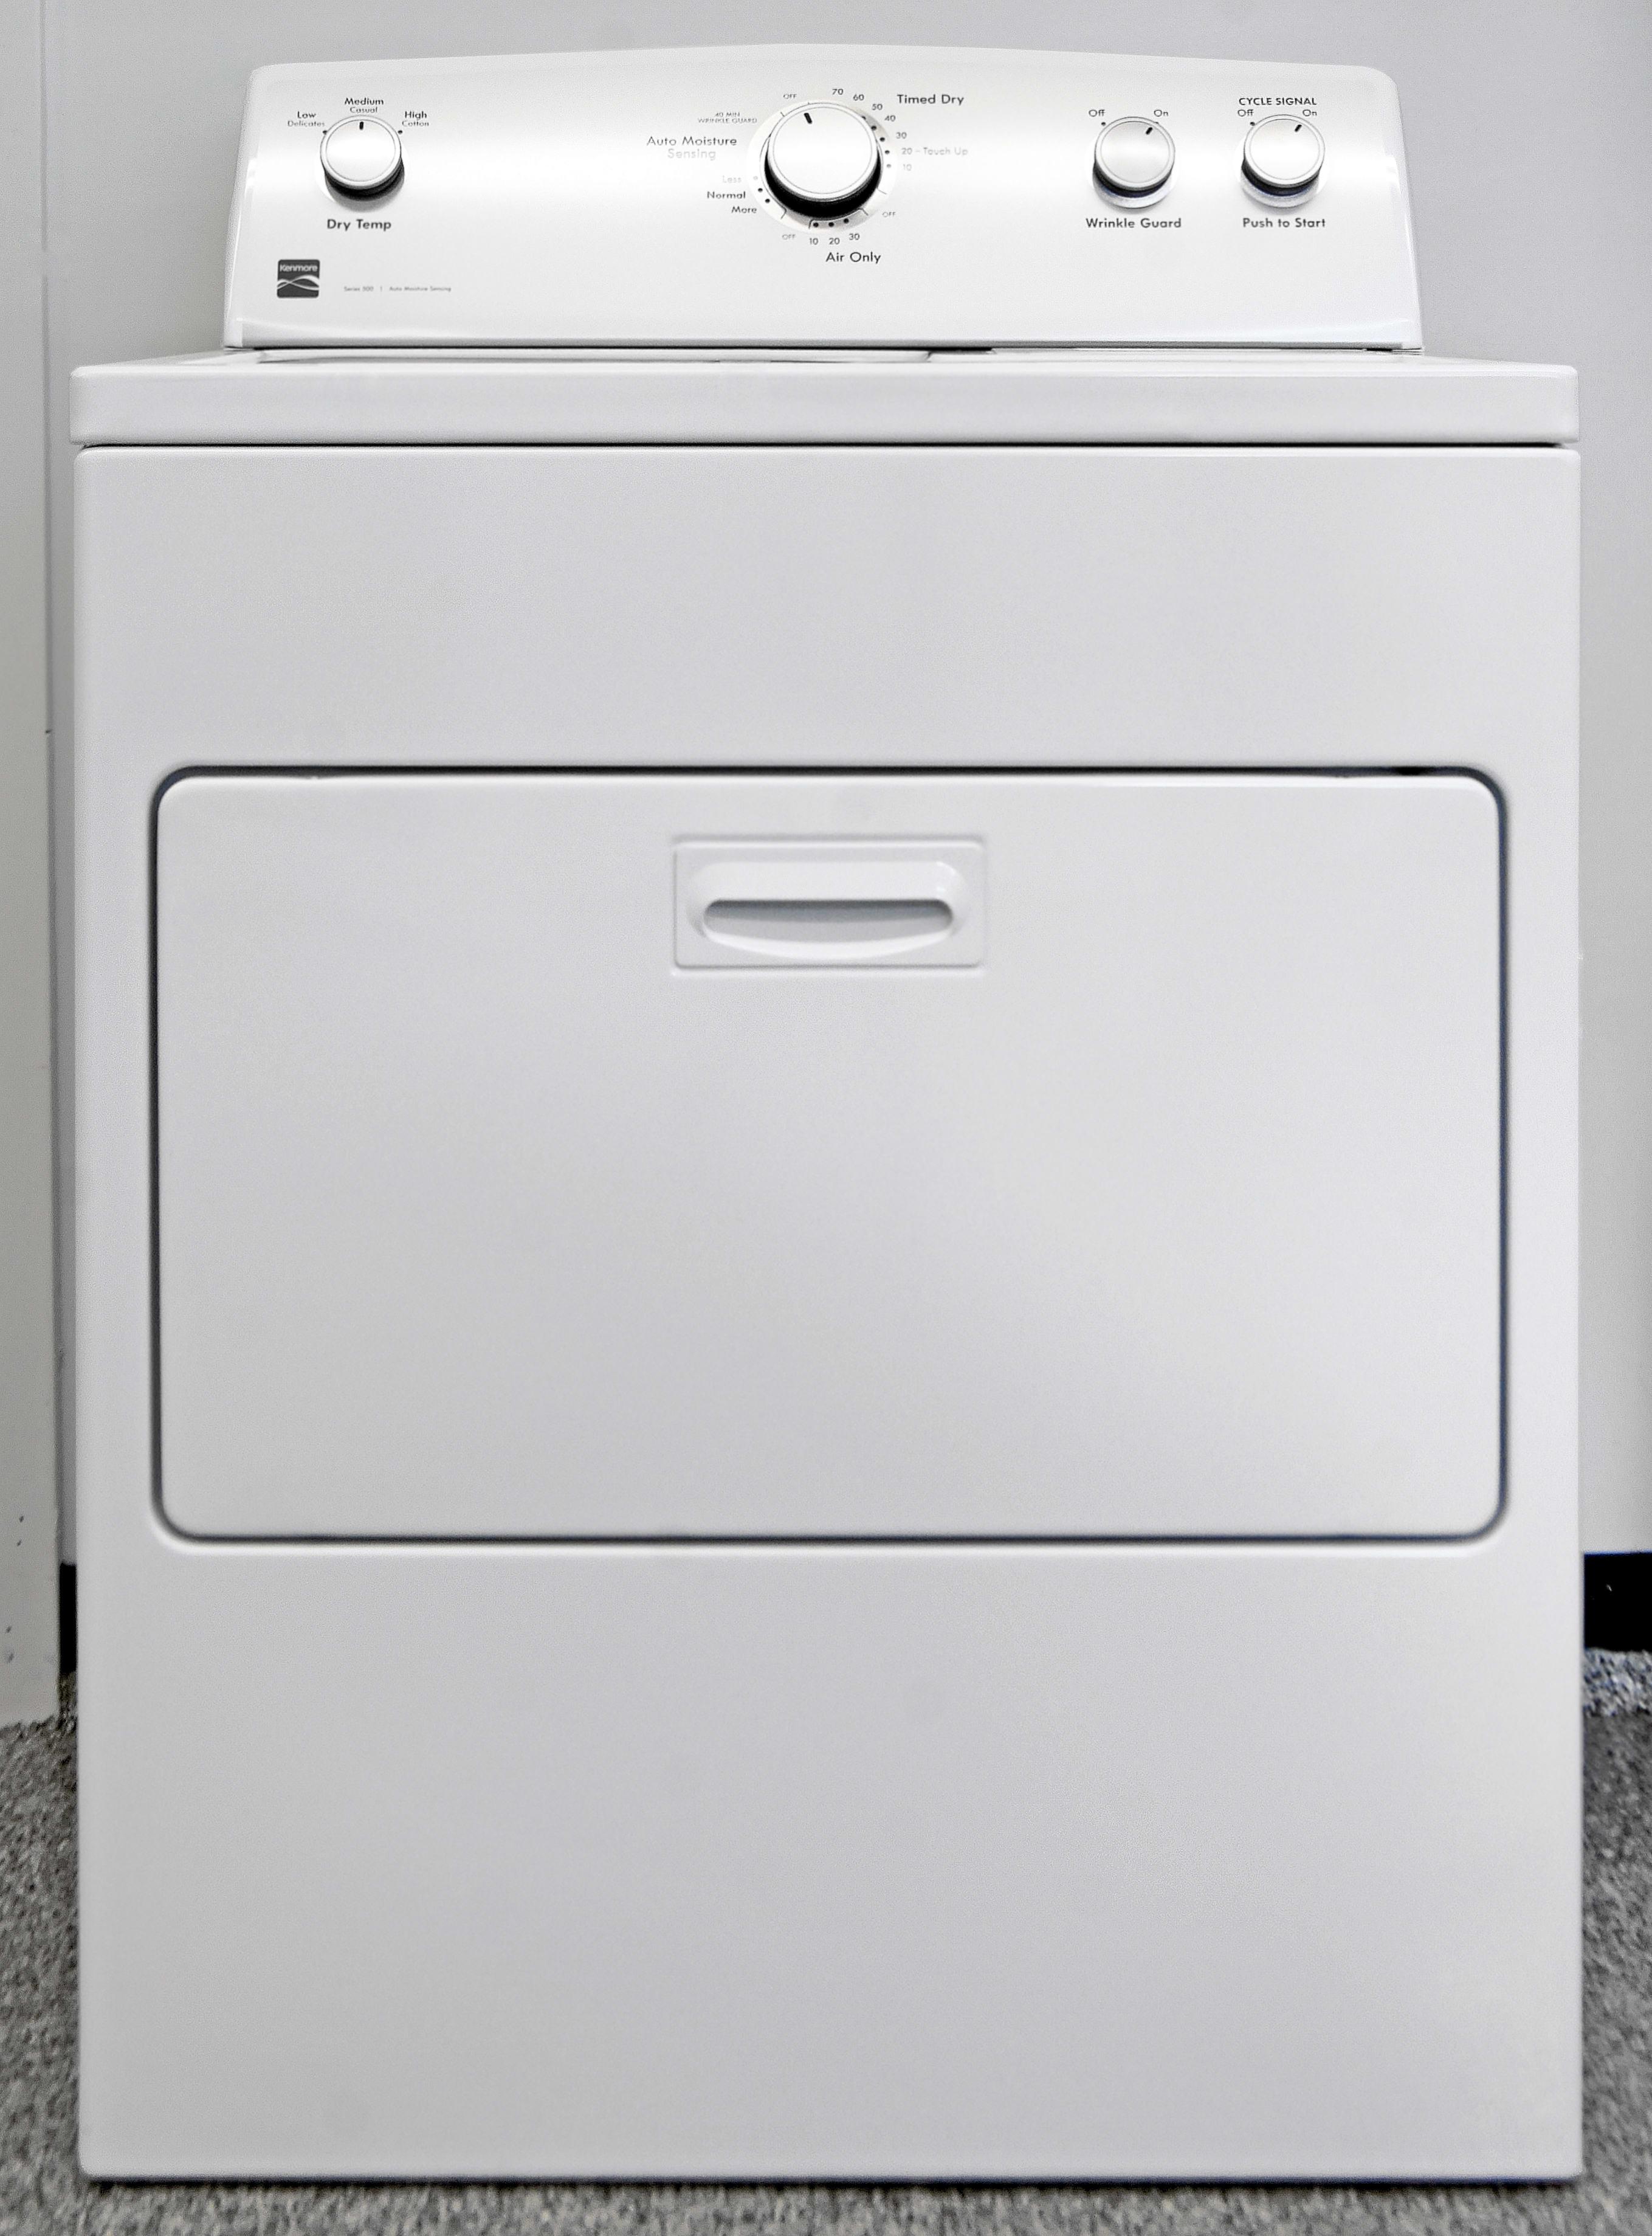 The basic Kenmore 65132 hamper dryer keeps laundry simple.